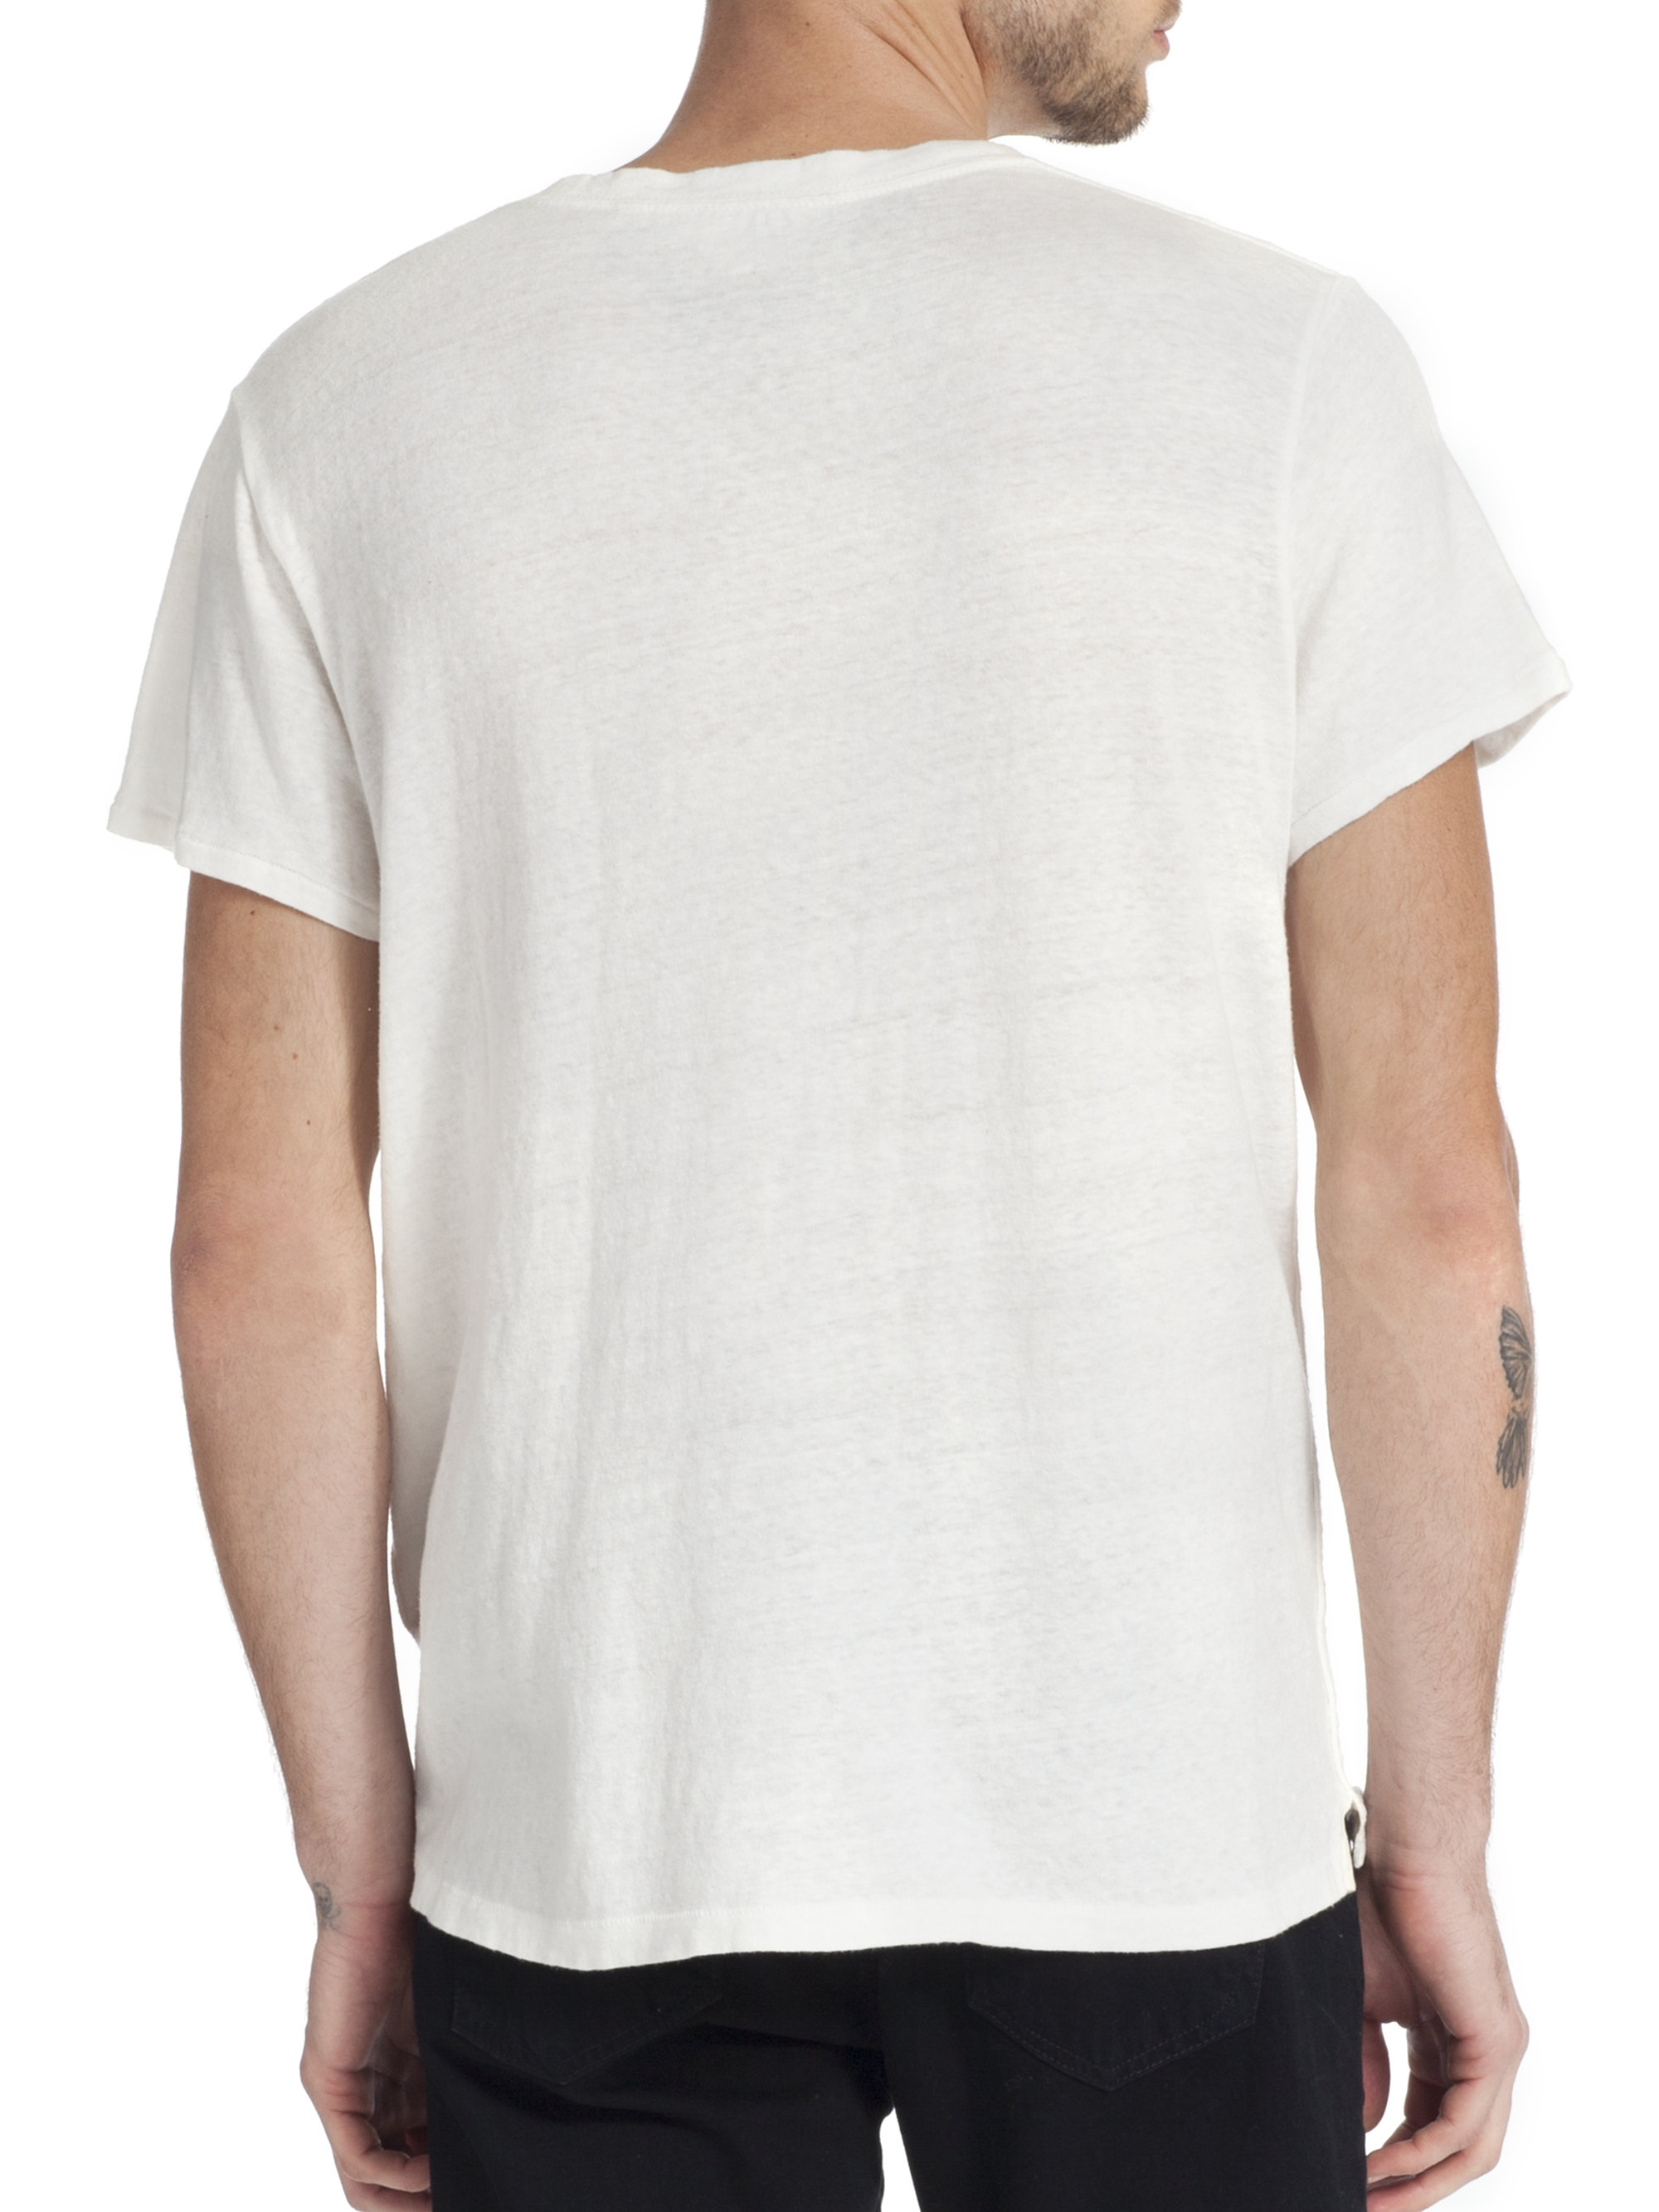 Lyst rag bone cotton logo t shirt in white for men for Rag and bone t shirts